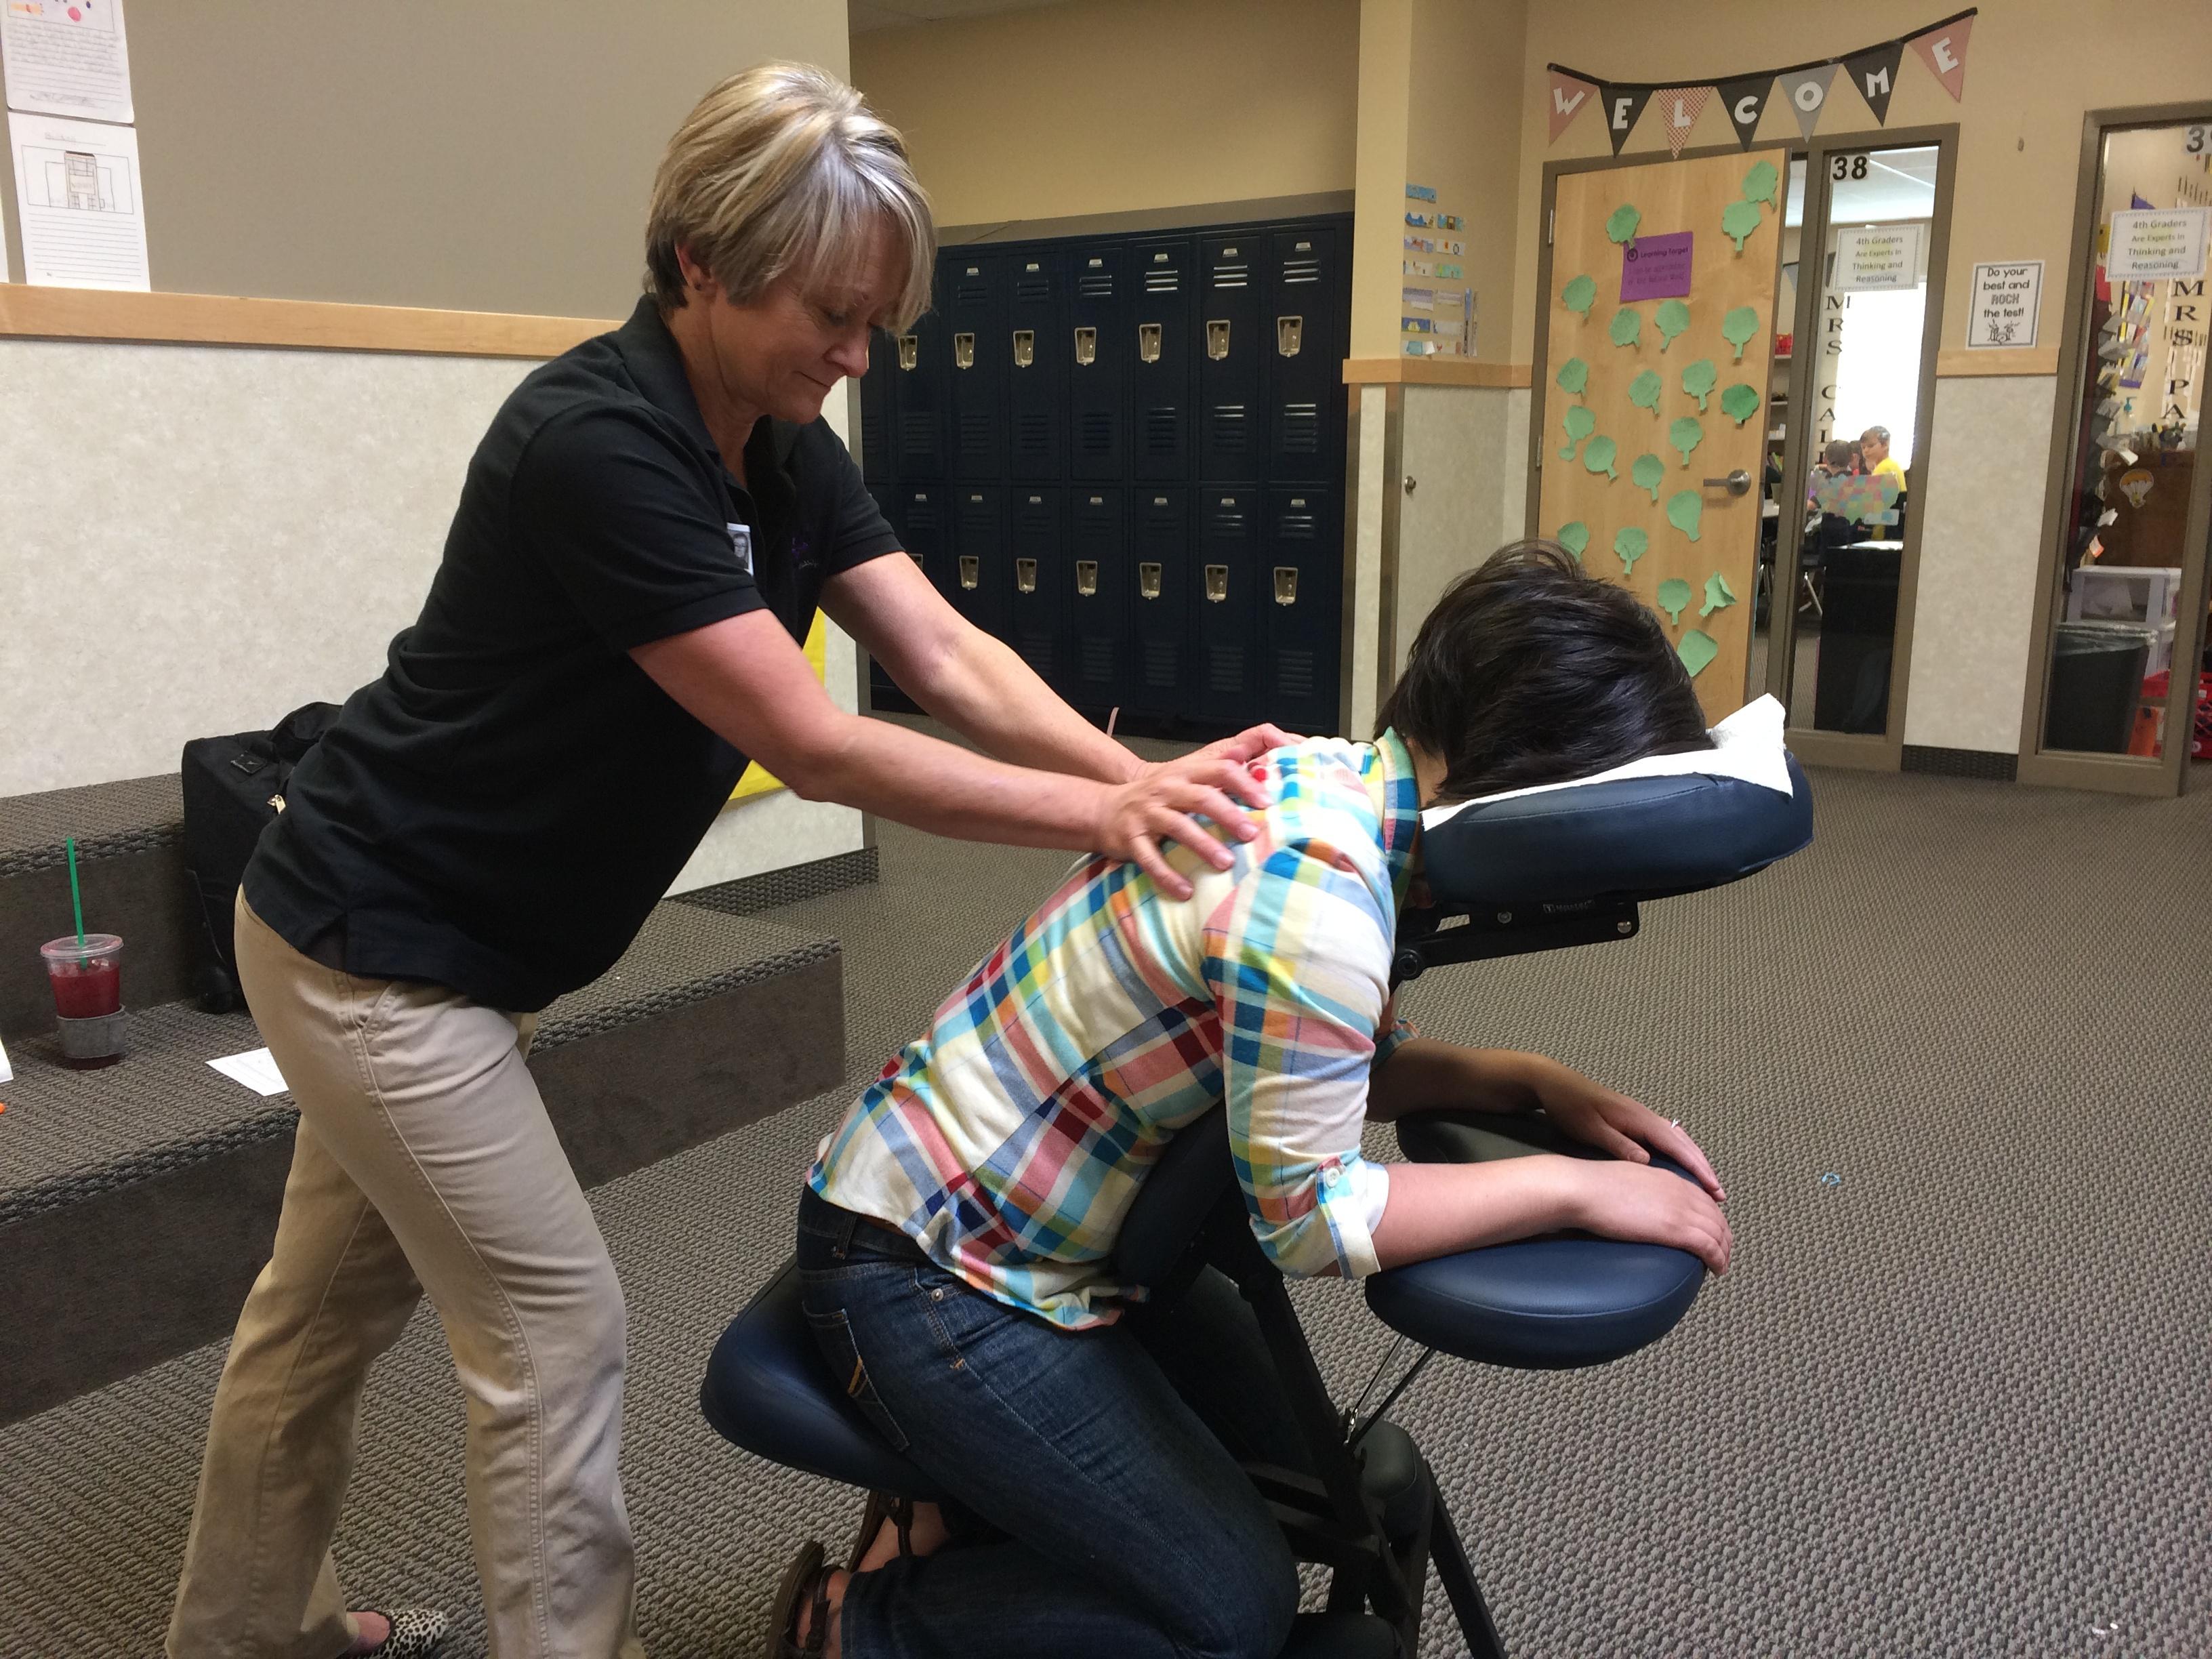 program management for office massage